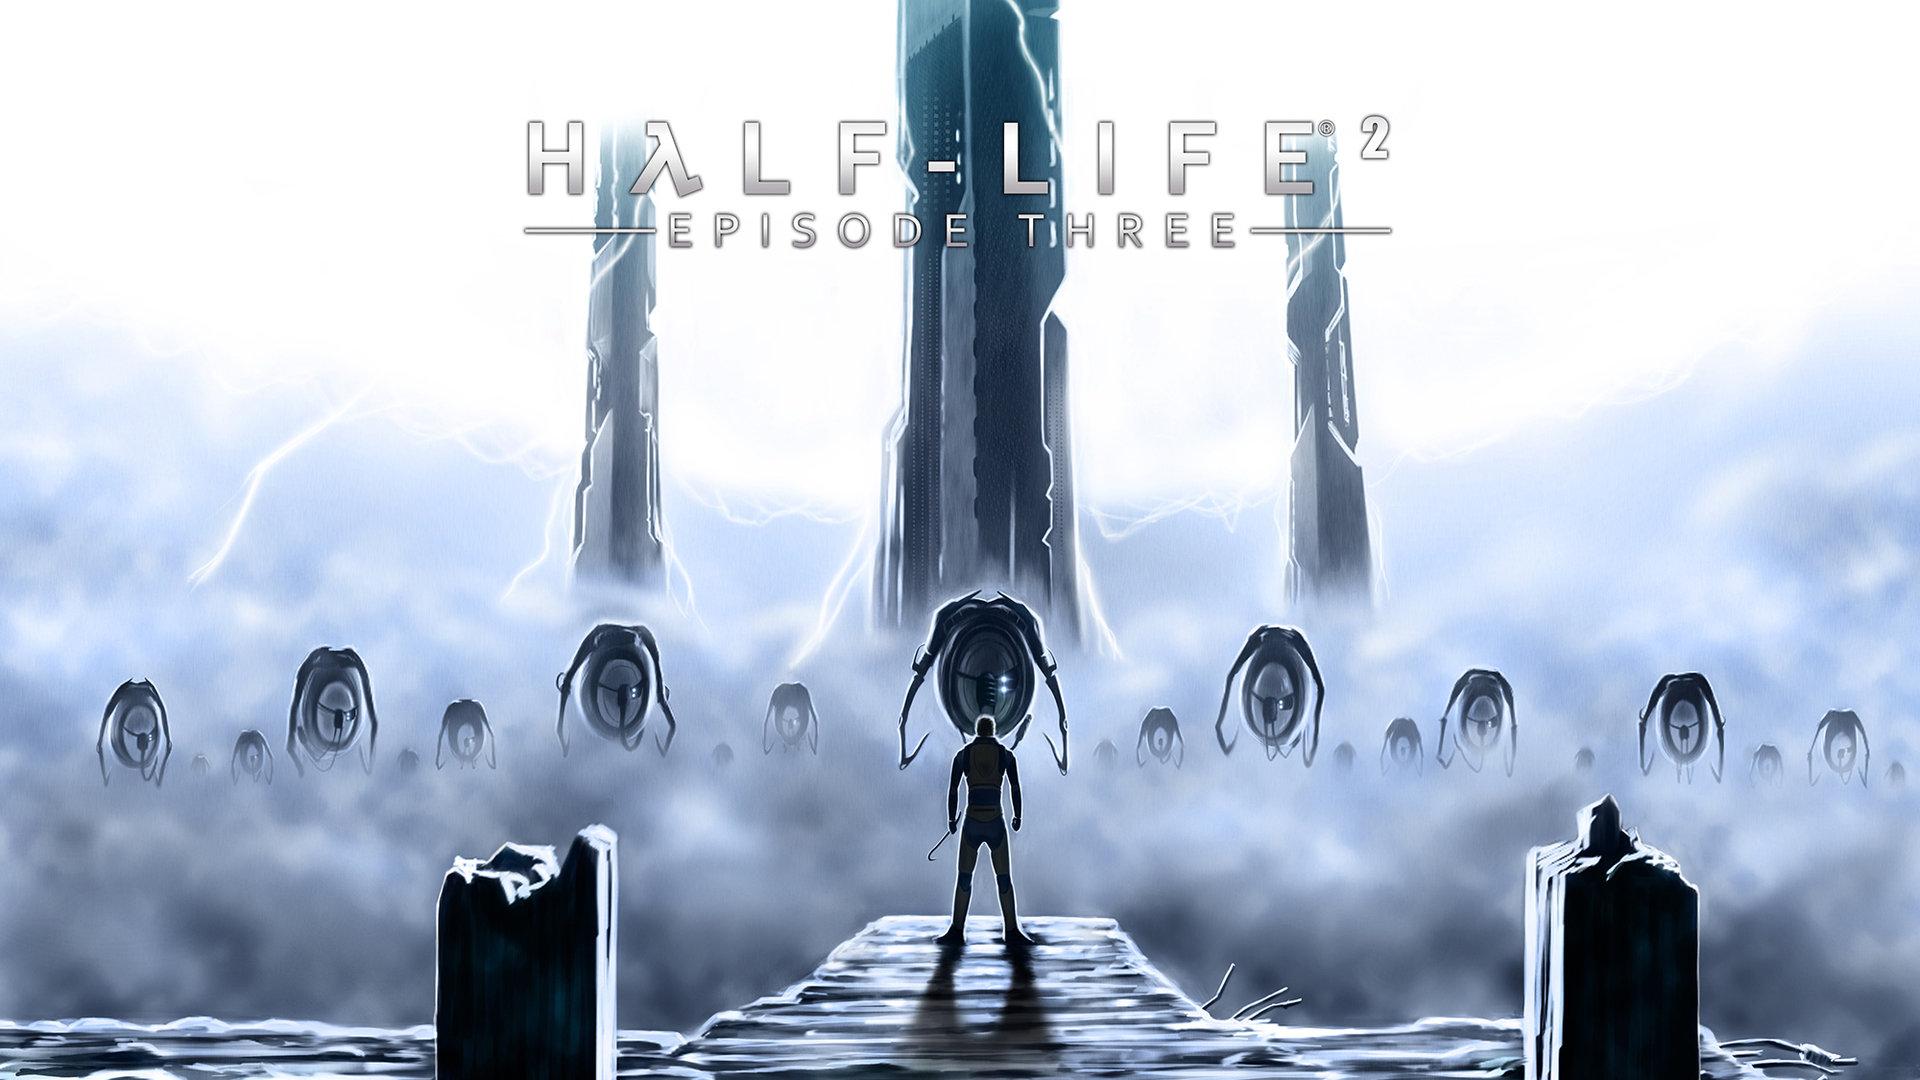 Half Life 2 Wallpapers 1920x1080 Full Hd 1080p Desktop Backgrounds